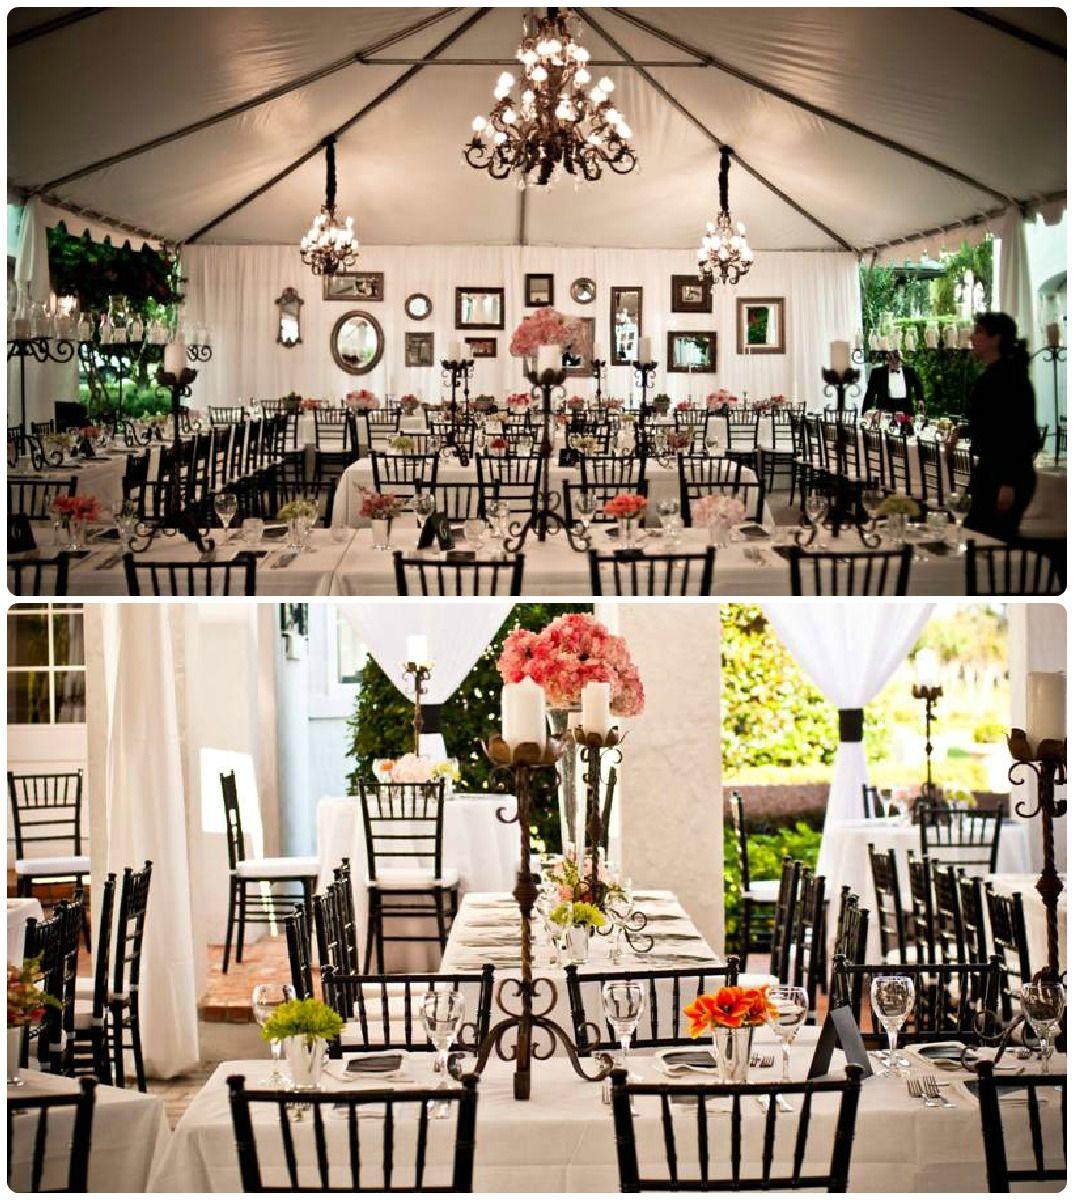 Tented Wedding Ideas, Orlando Weddings, Czes Heard Designs